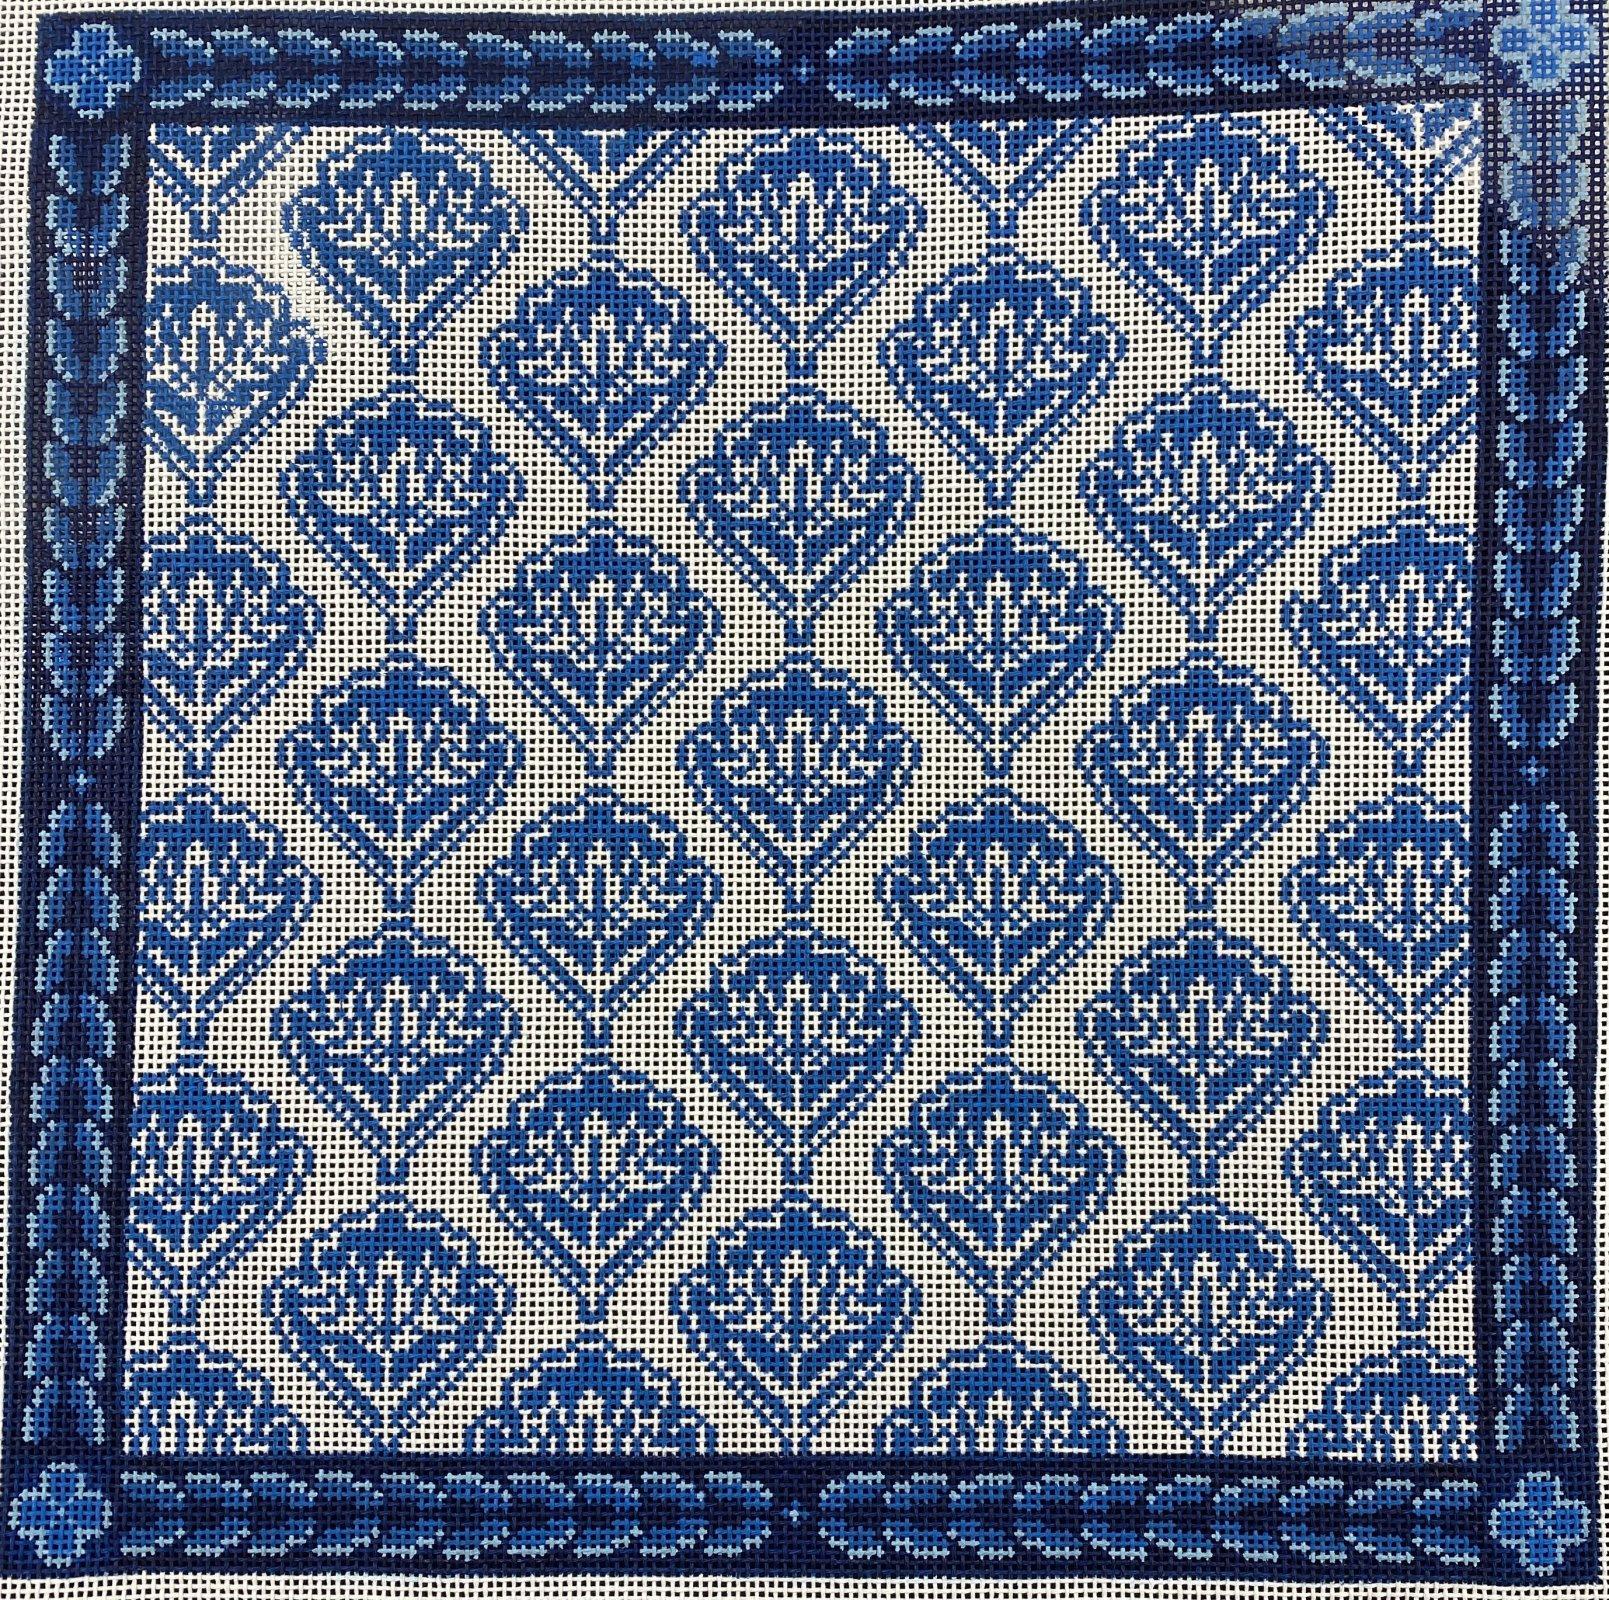 Blue Medallion Floral,13 ct.,16.5x17